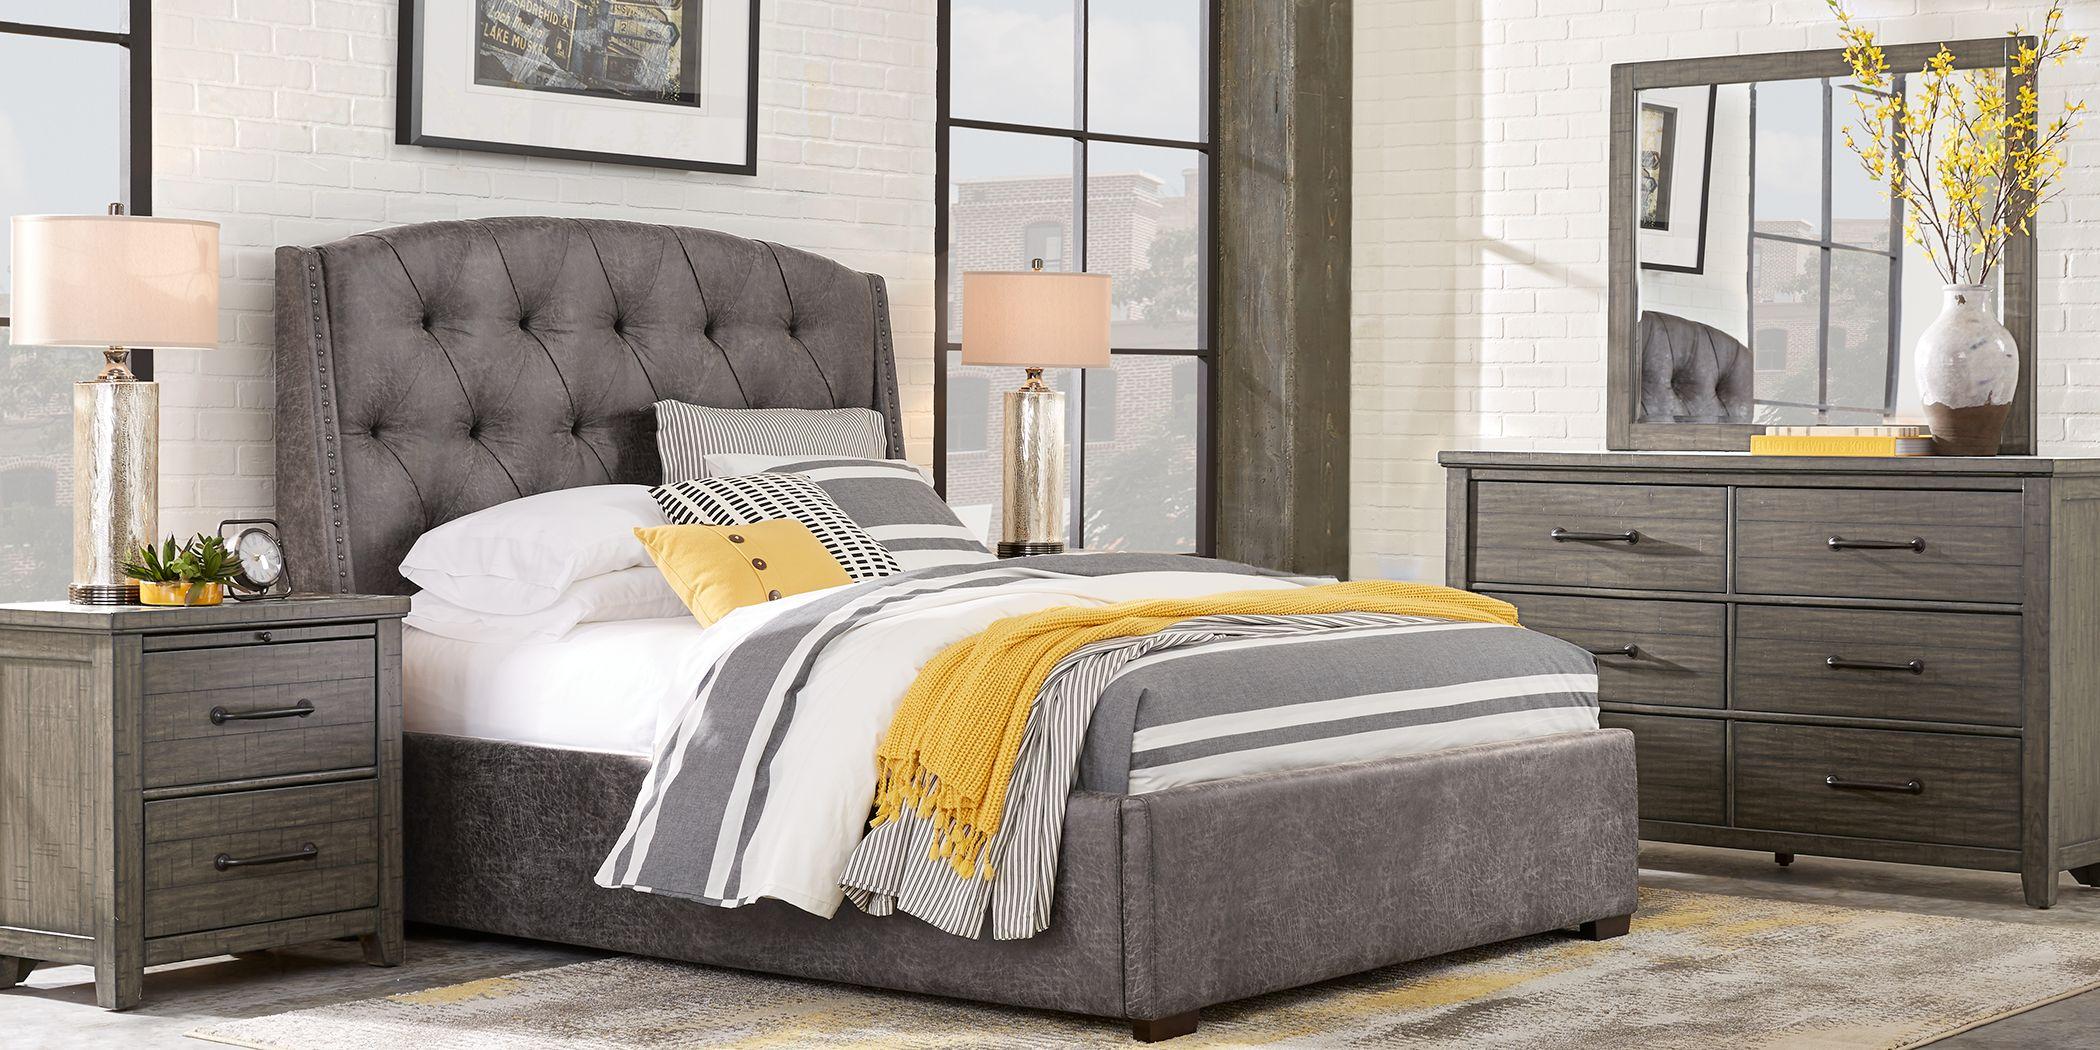 Urban Plains Gray 5 Pc King Upholstered Bedroom